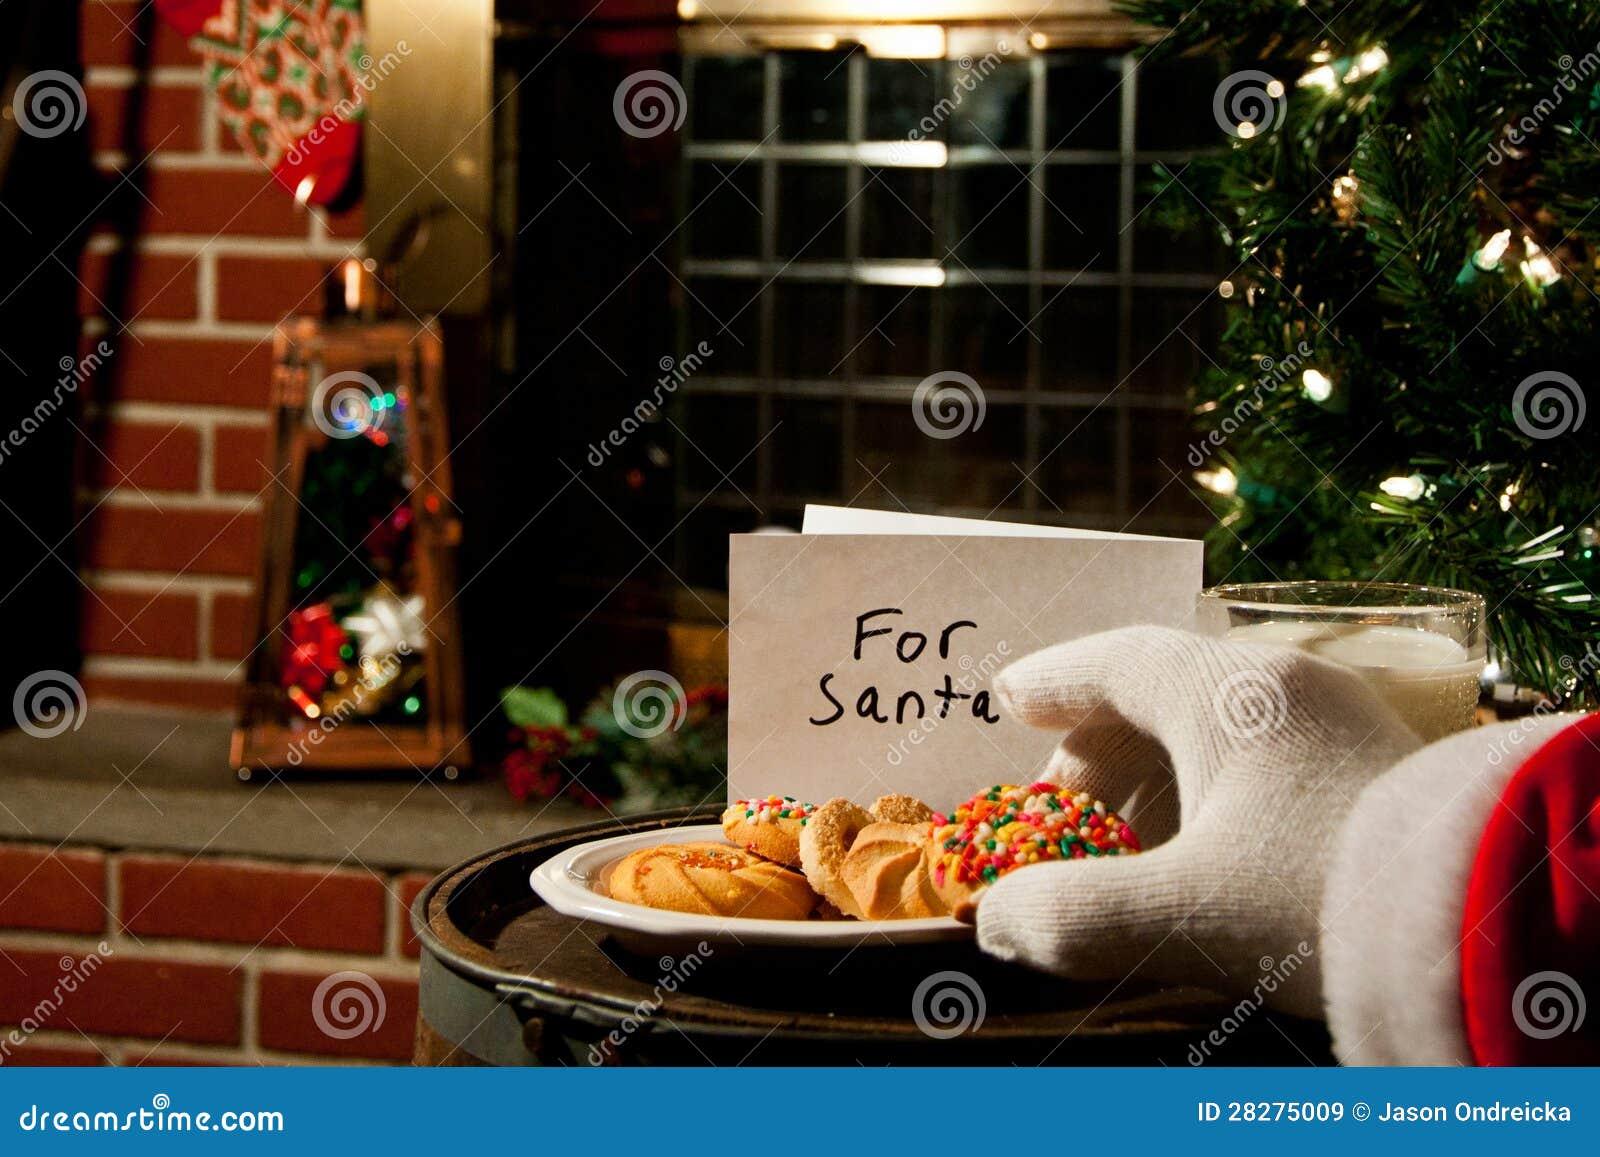 Santa Claus Taking A Cookie Stock Image Image Of Decor Catholic